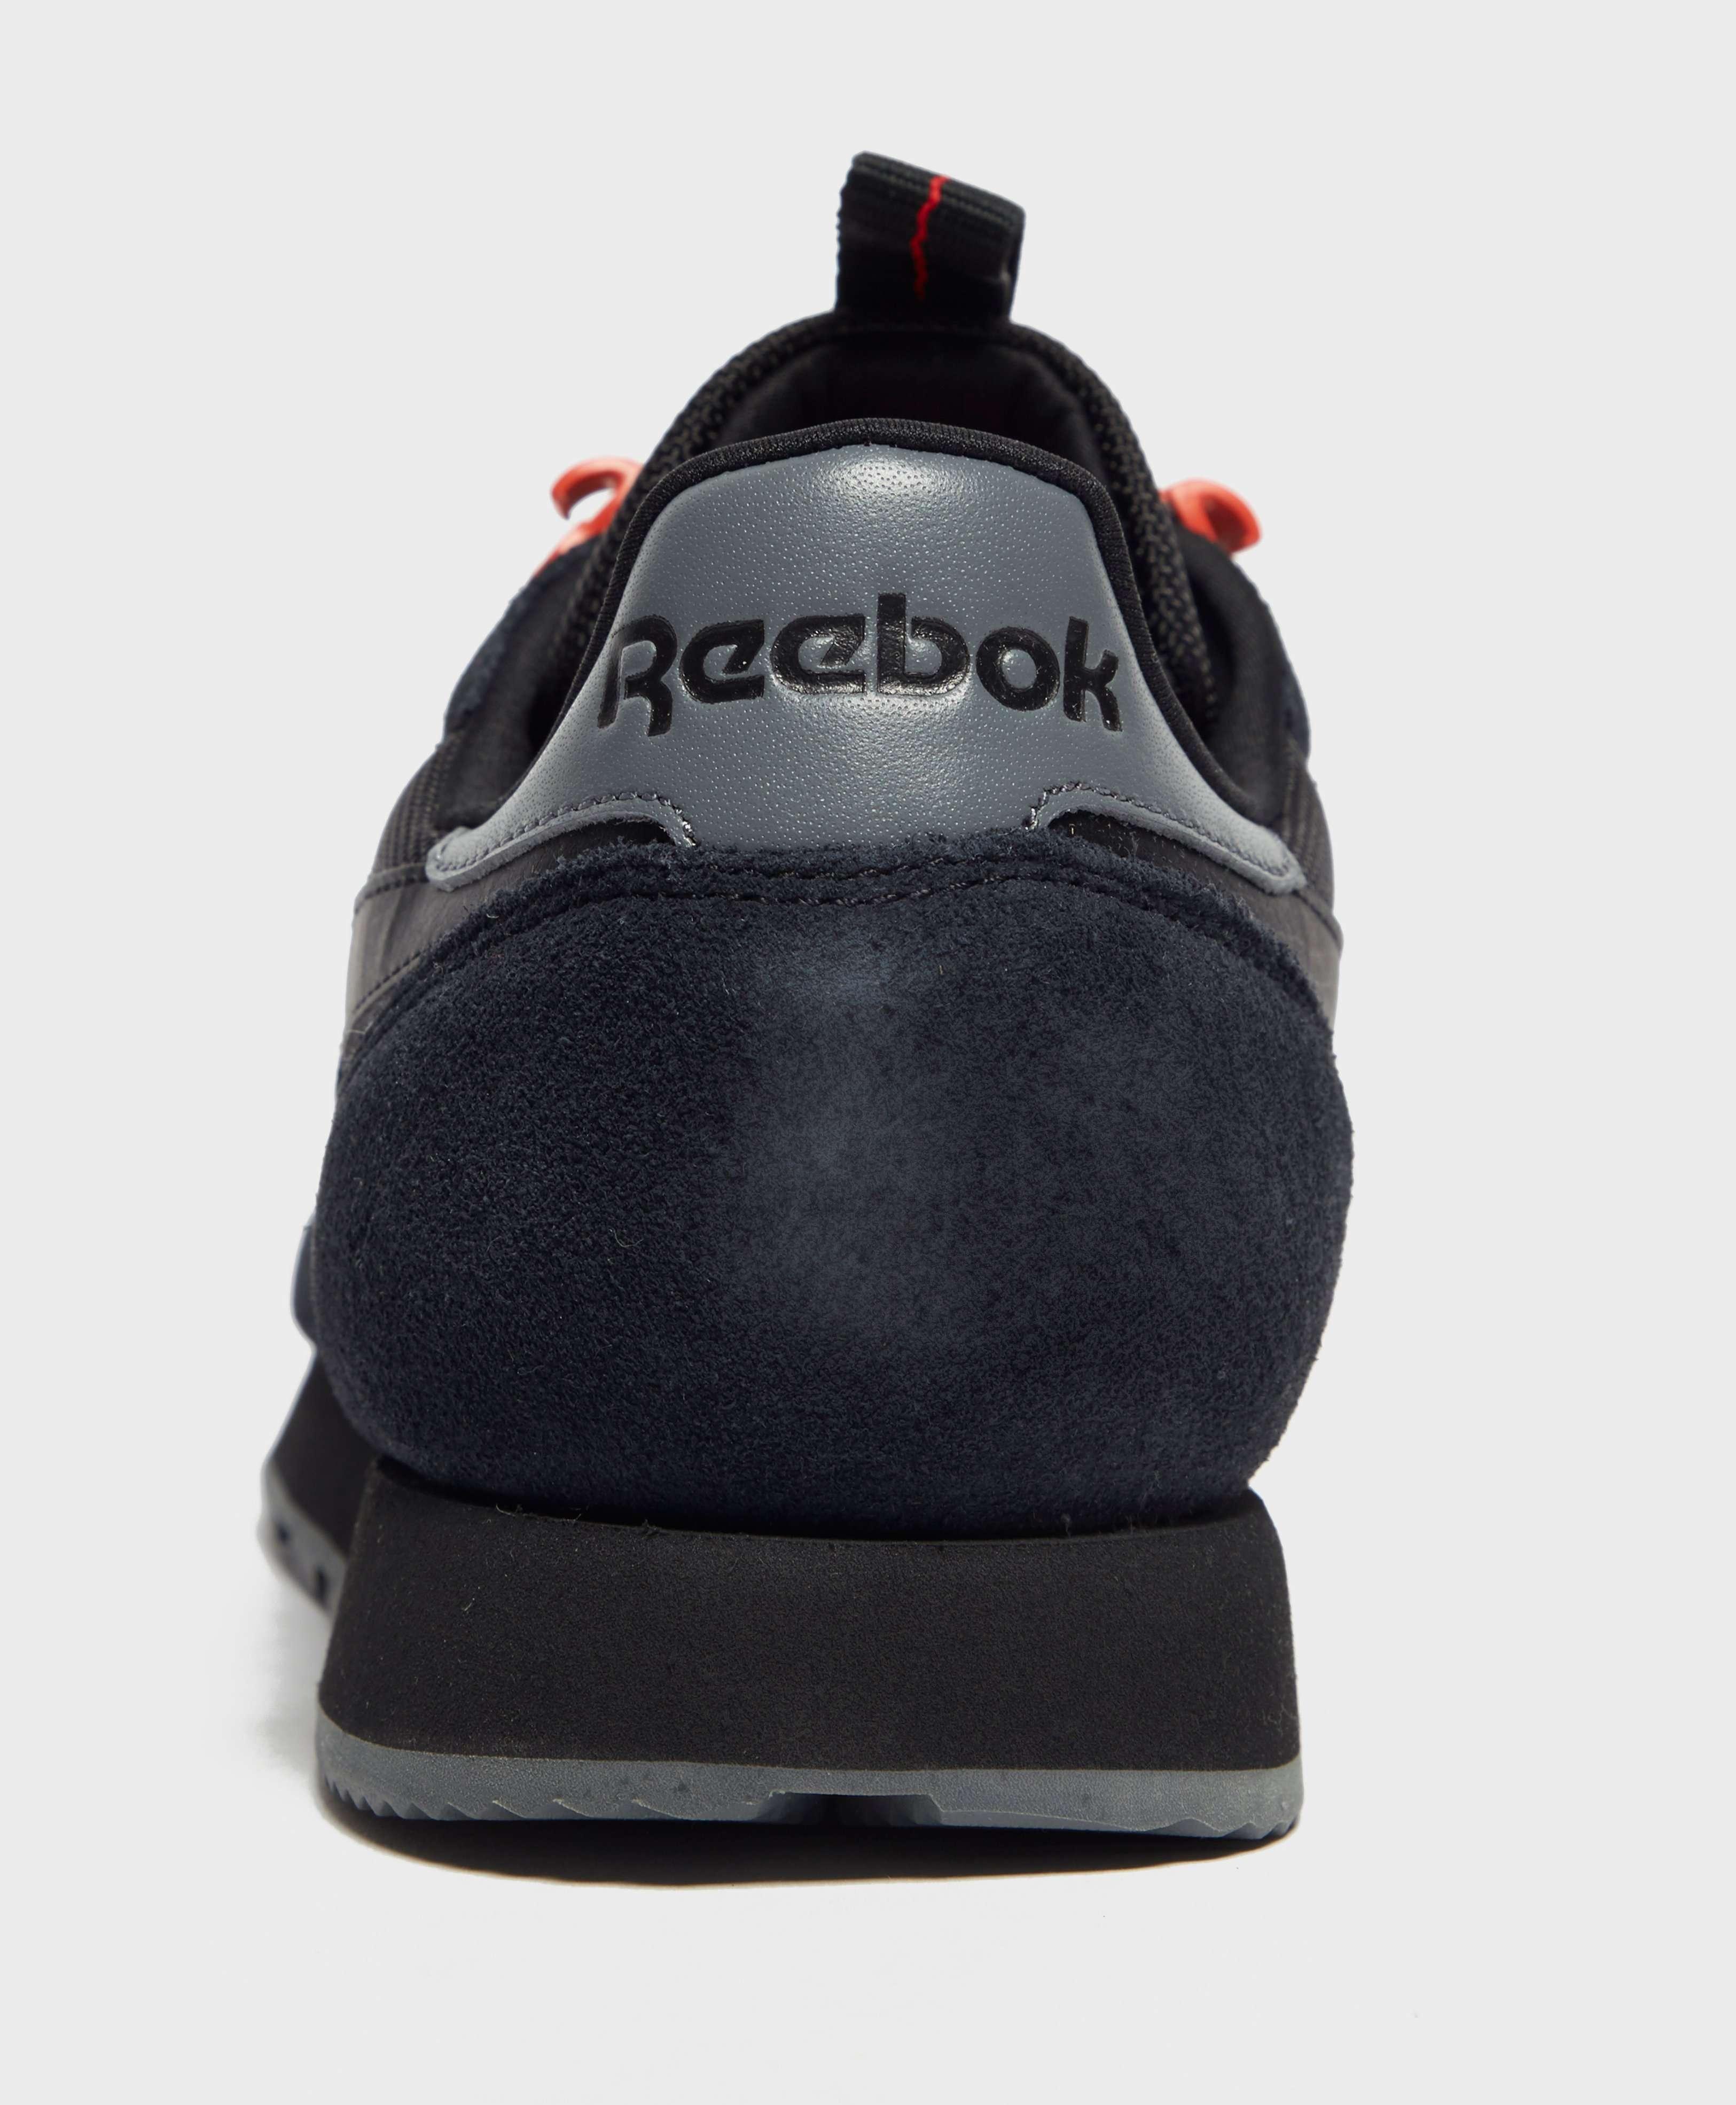 Reebok Classic Leather Explore